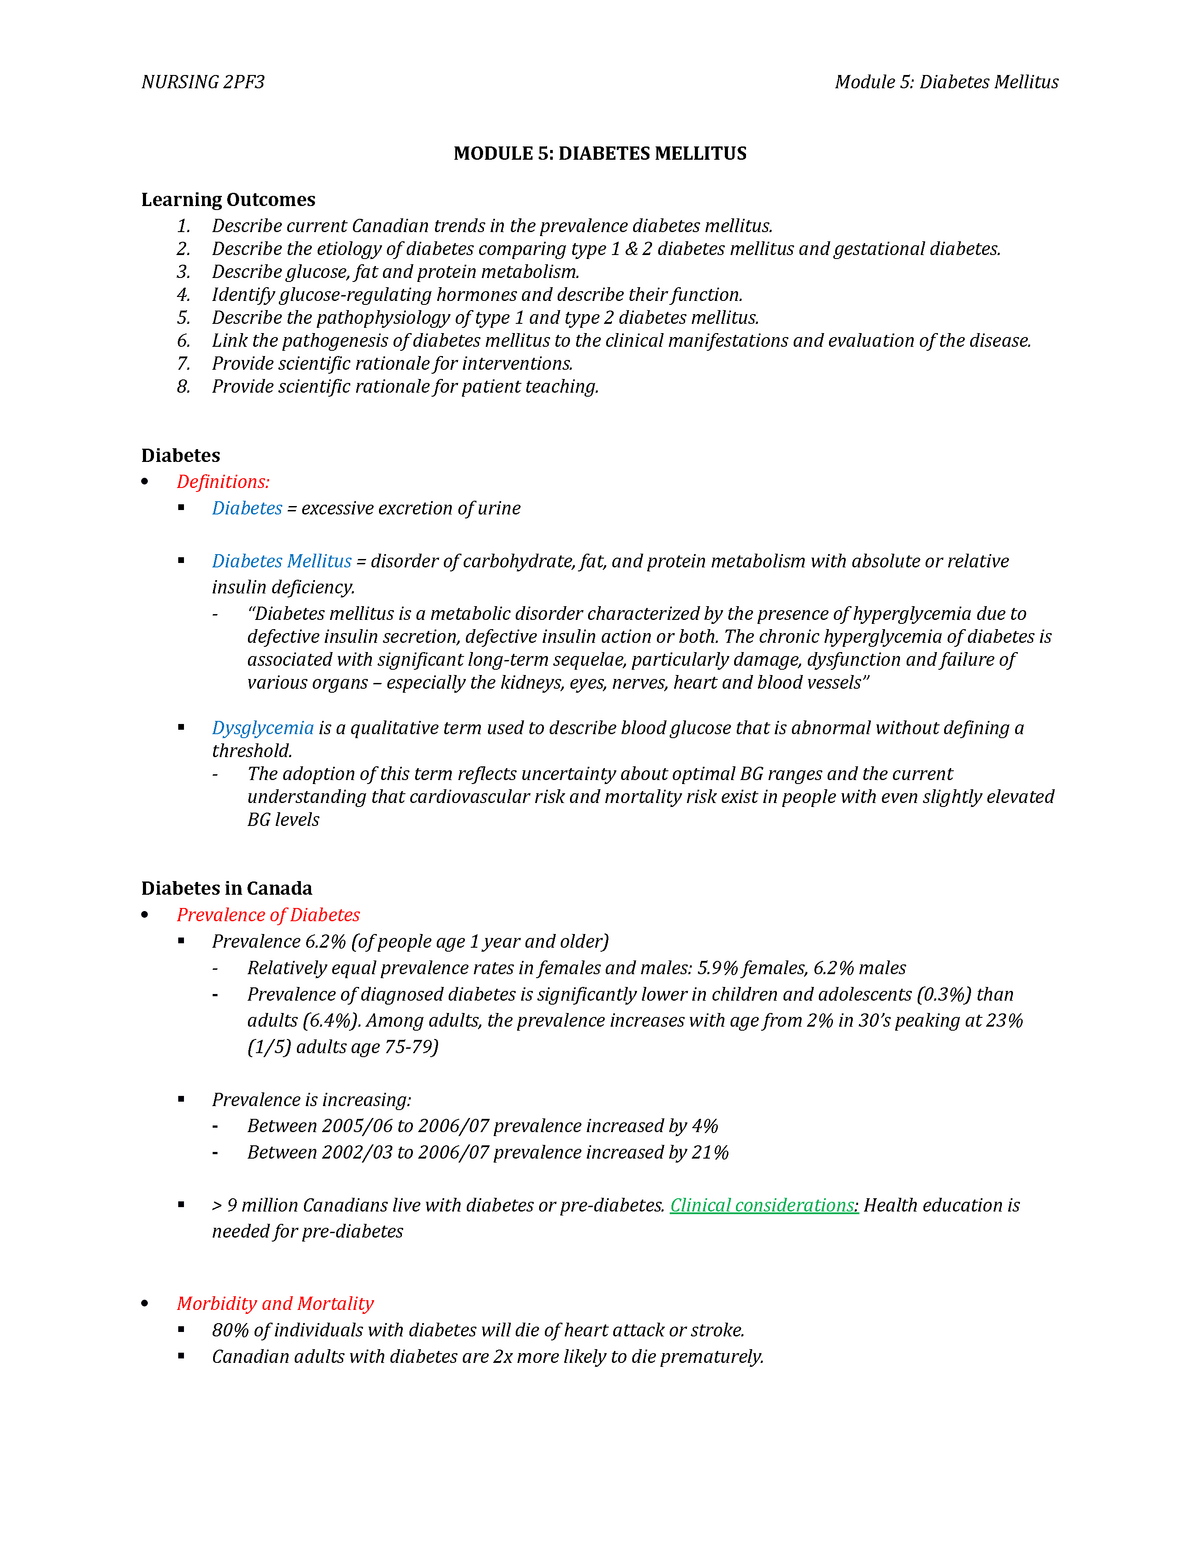 Pathophysiology 05 - Module 5 - Diabetes - Nursing 2Pf3